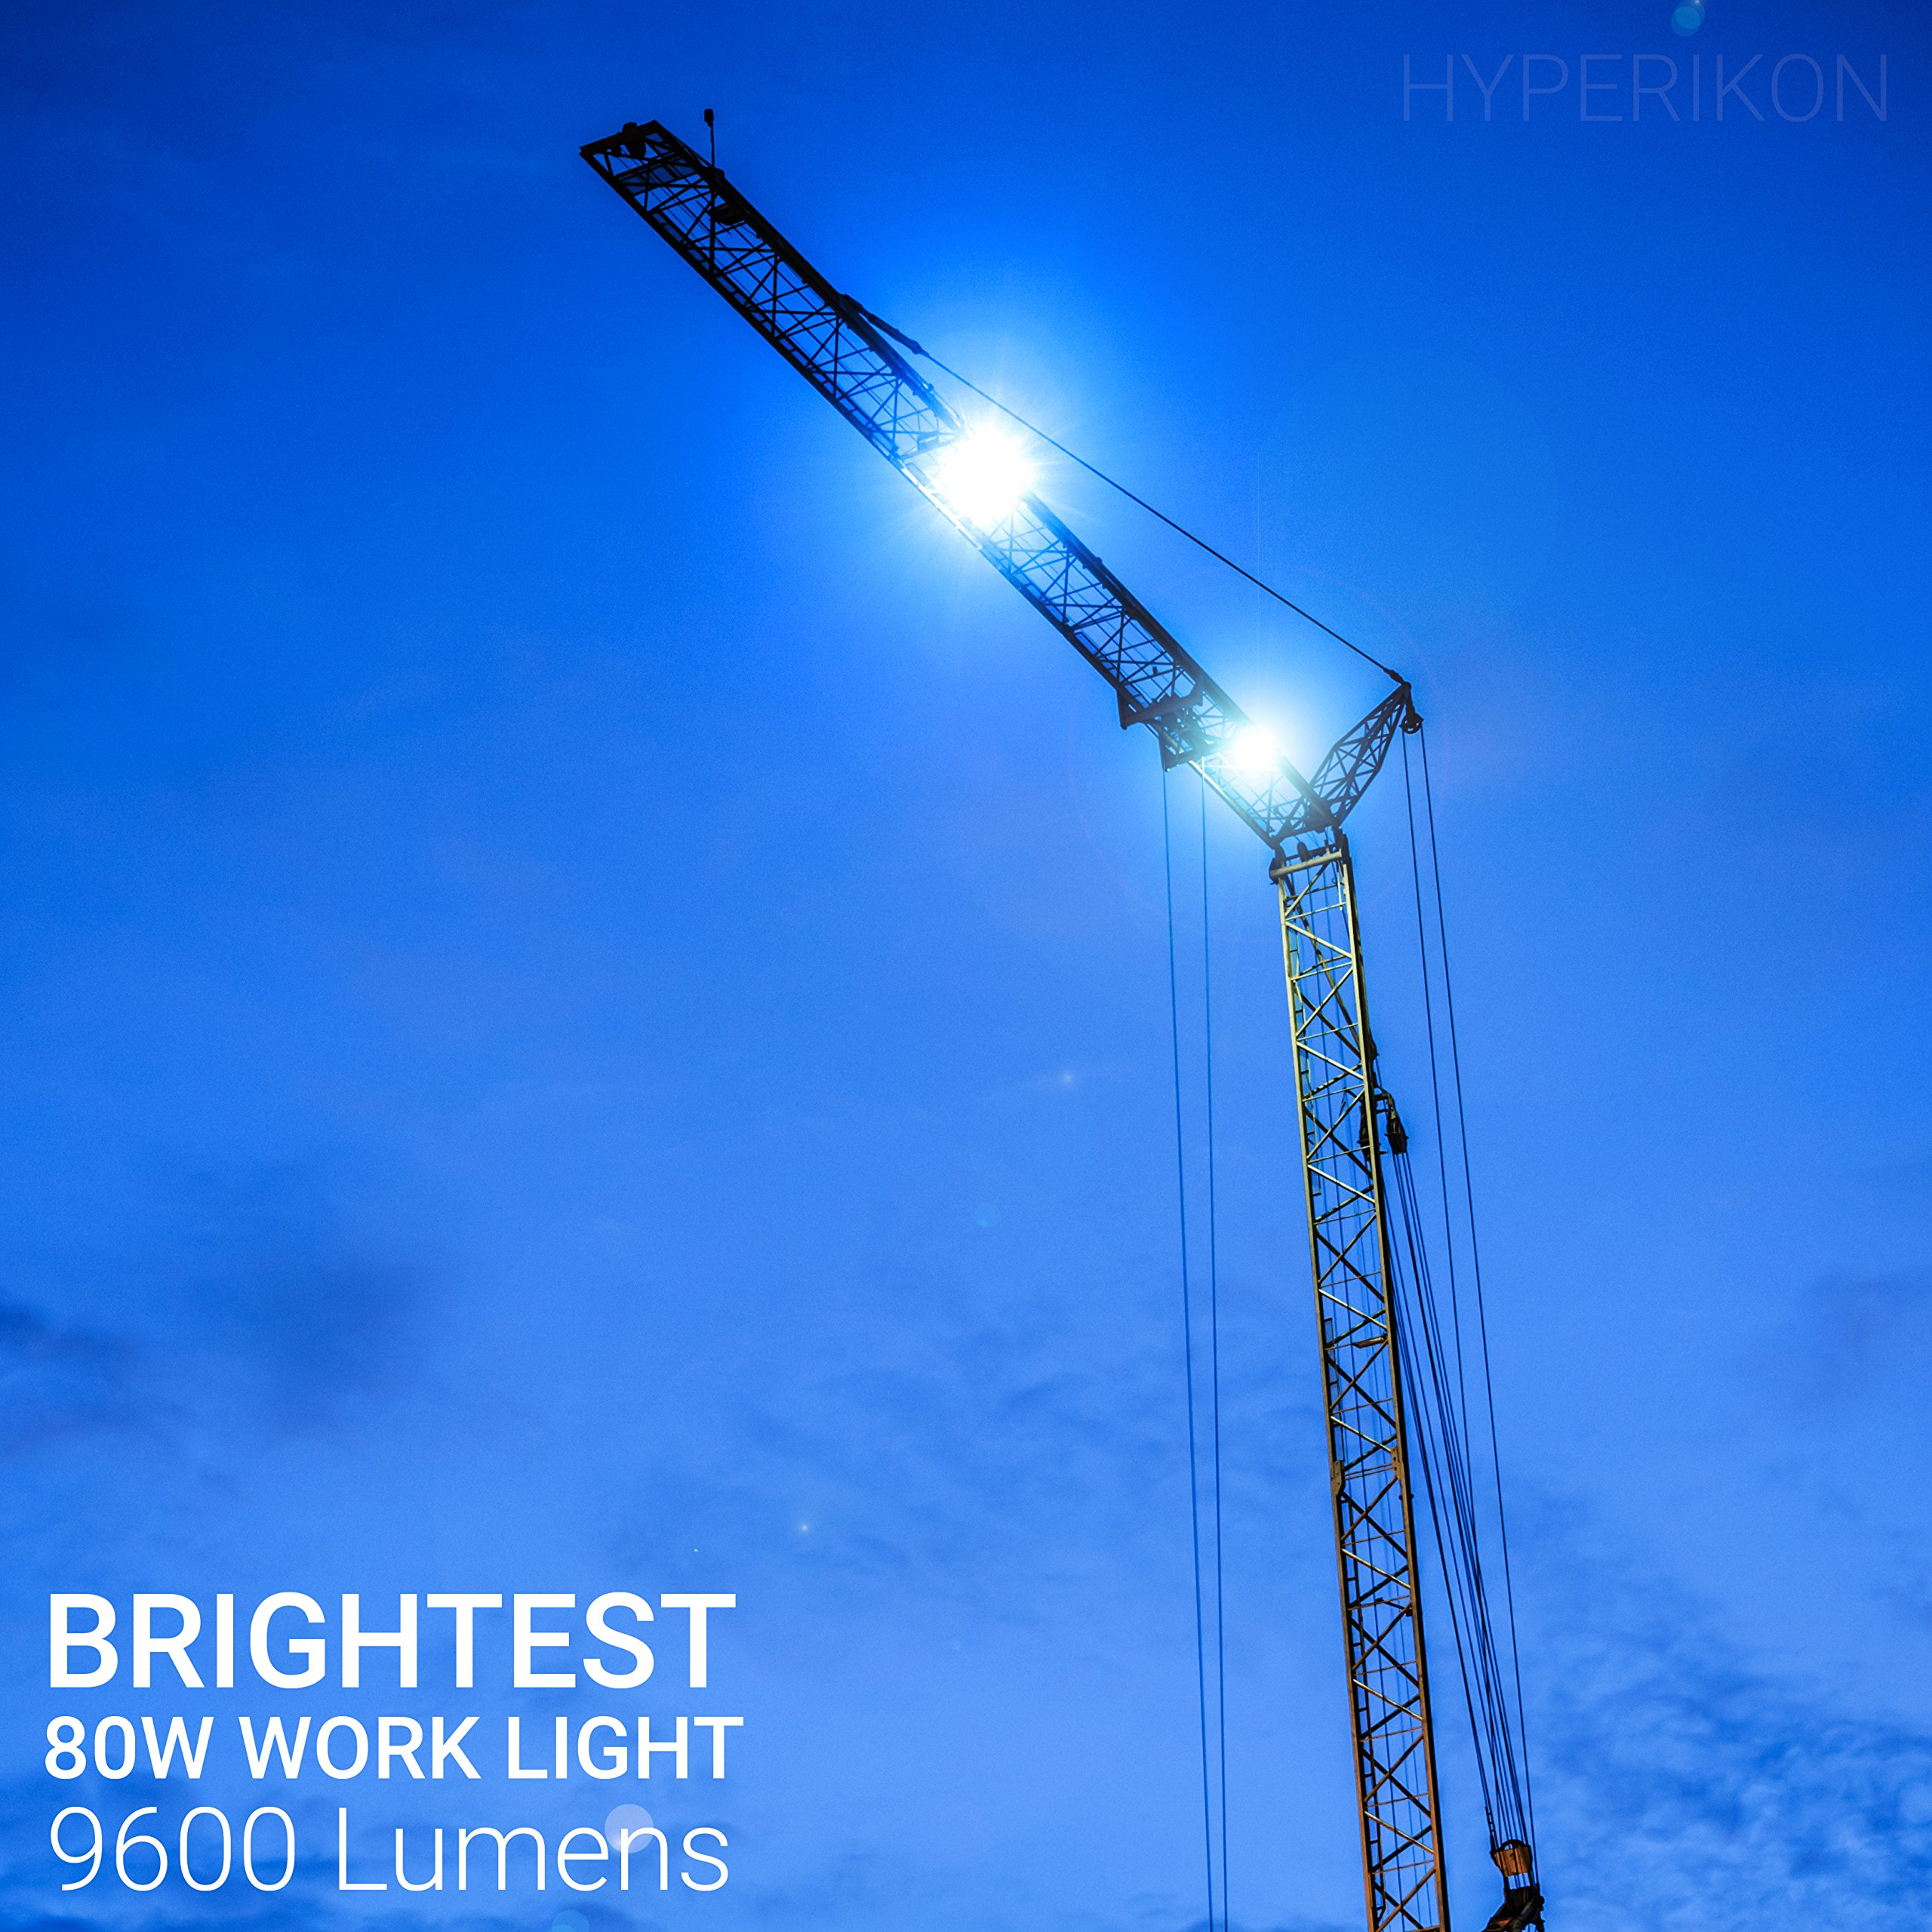 Hyperikon 80W LED Temporary Work Light Fixture, 9600 Lumens, Orange Construction Drop Light, LED High Bay Lighting, UL IP65 Waterproof, 5000K by Hyperikon (Image #3)